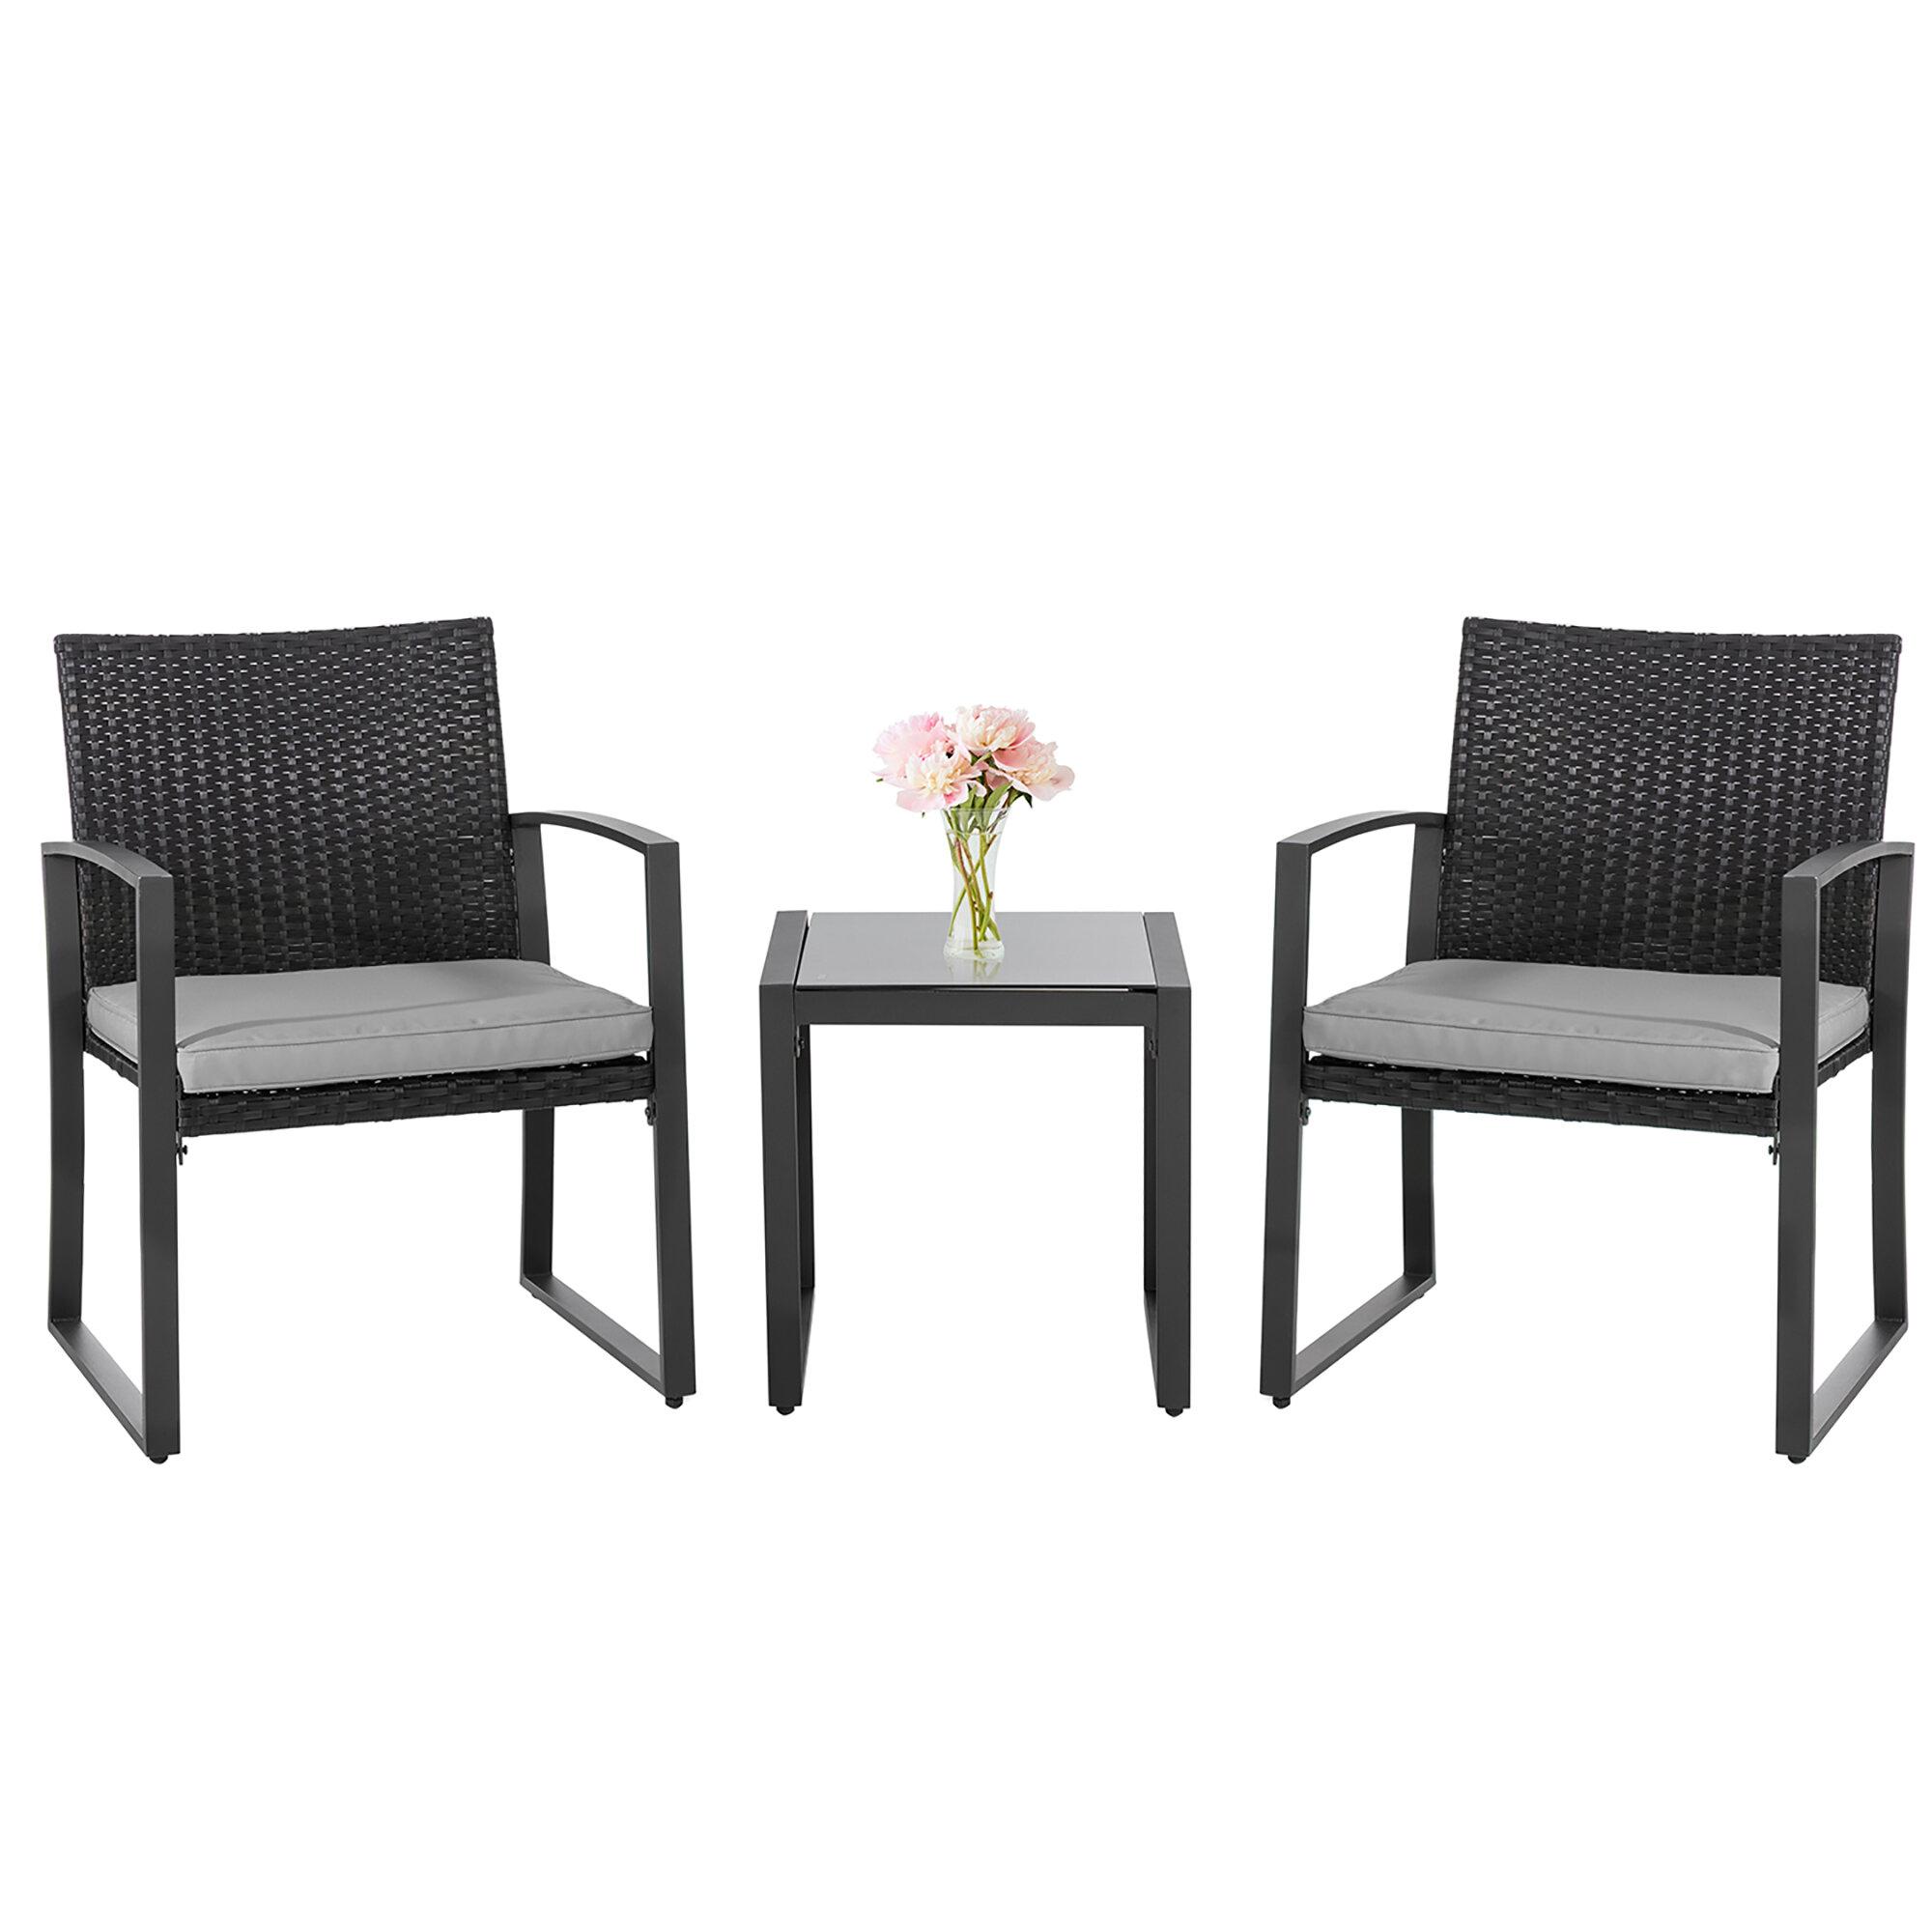 Shintenchi-outdoor-furniture-1 15 Unique Furniture Designs for Outdoor Small Spaces